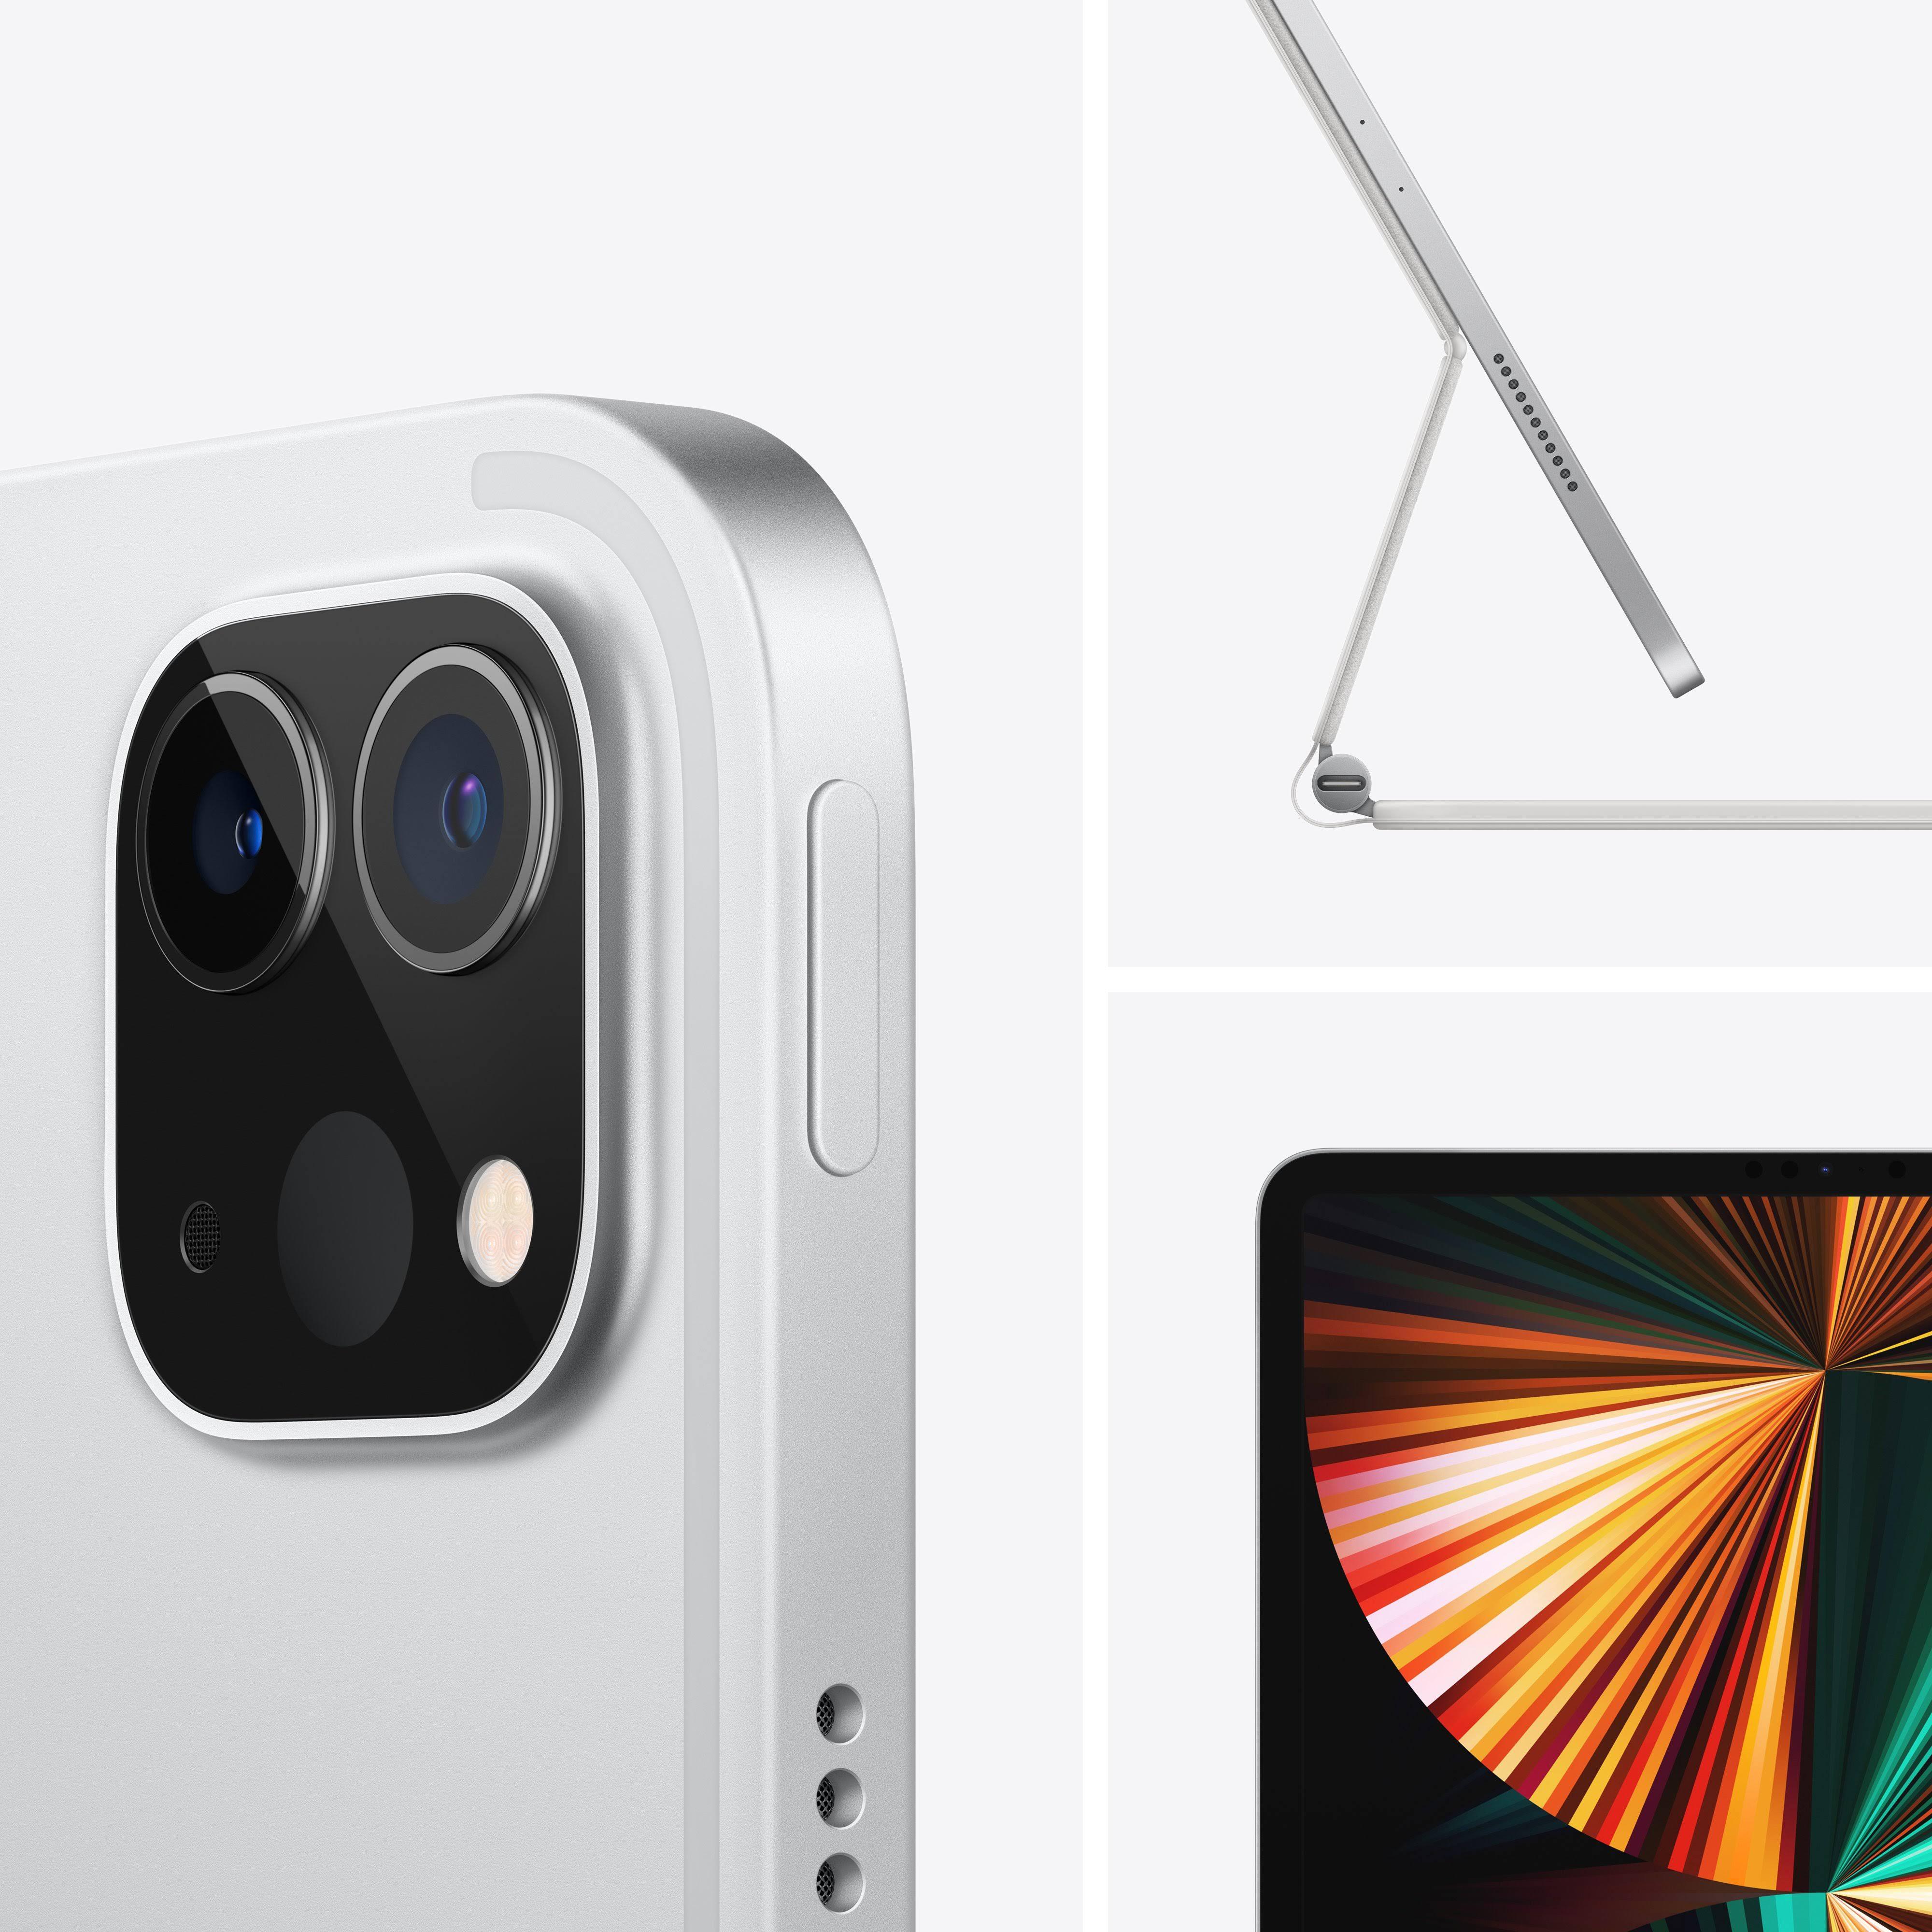 Apple iPad Pro 5th Generation (12.9)